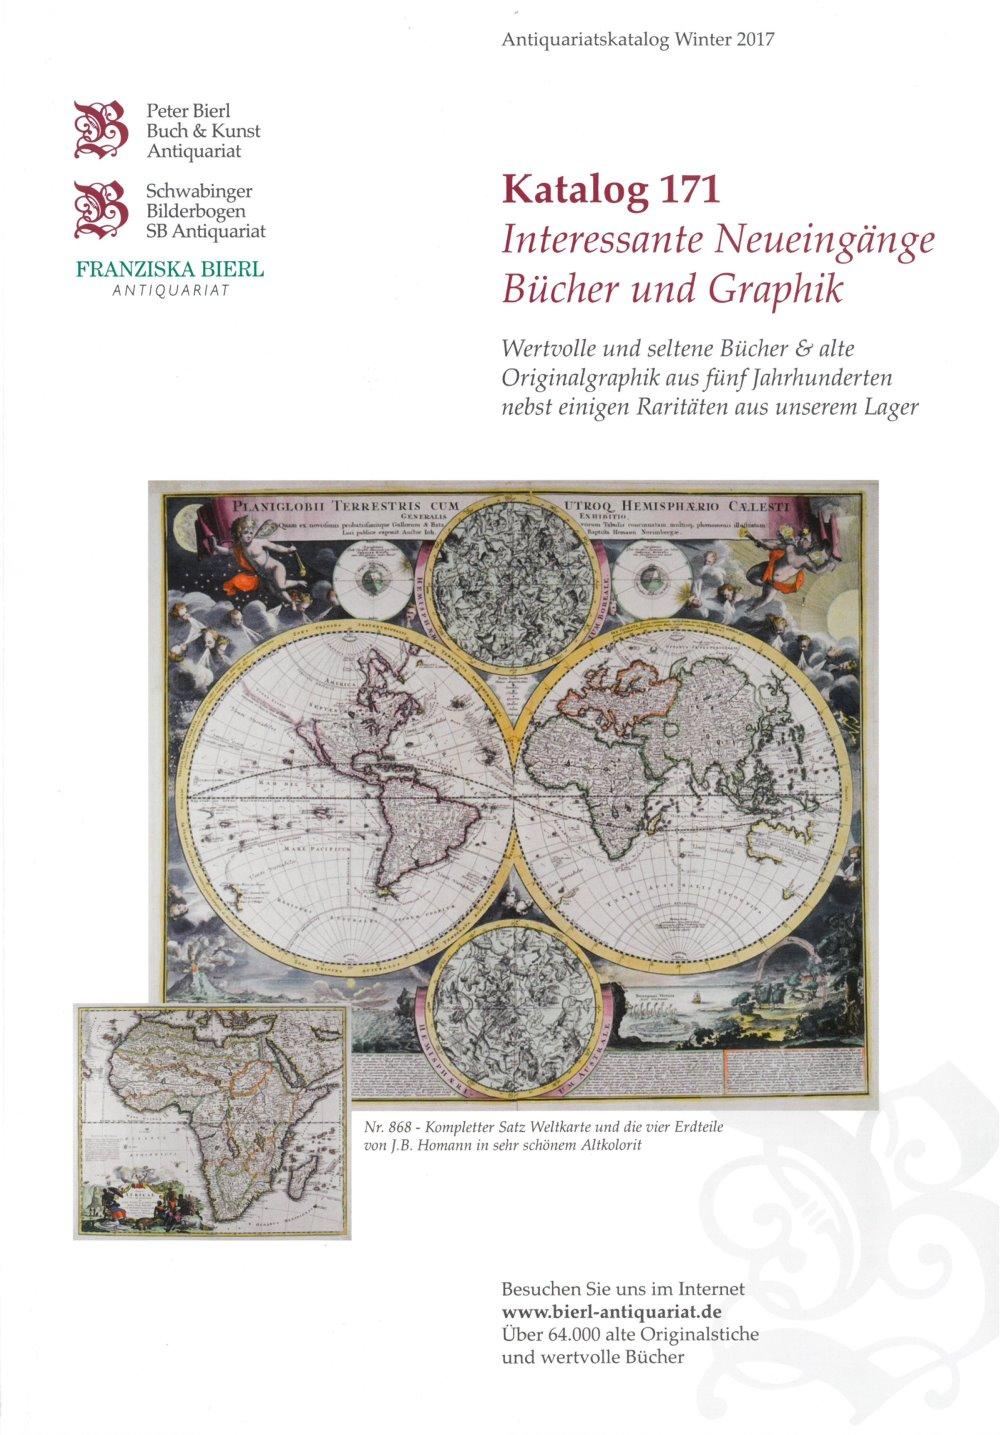 Katalog 171 - Interessante Neueingänge